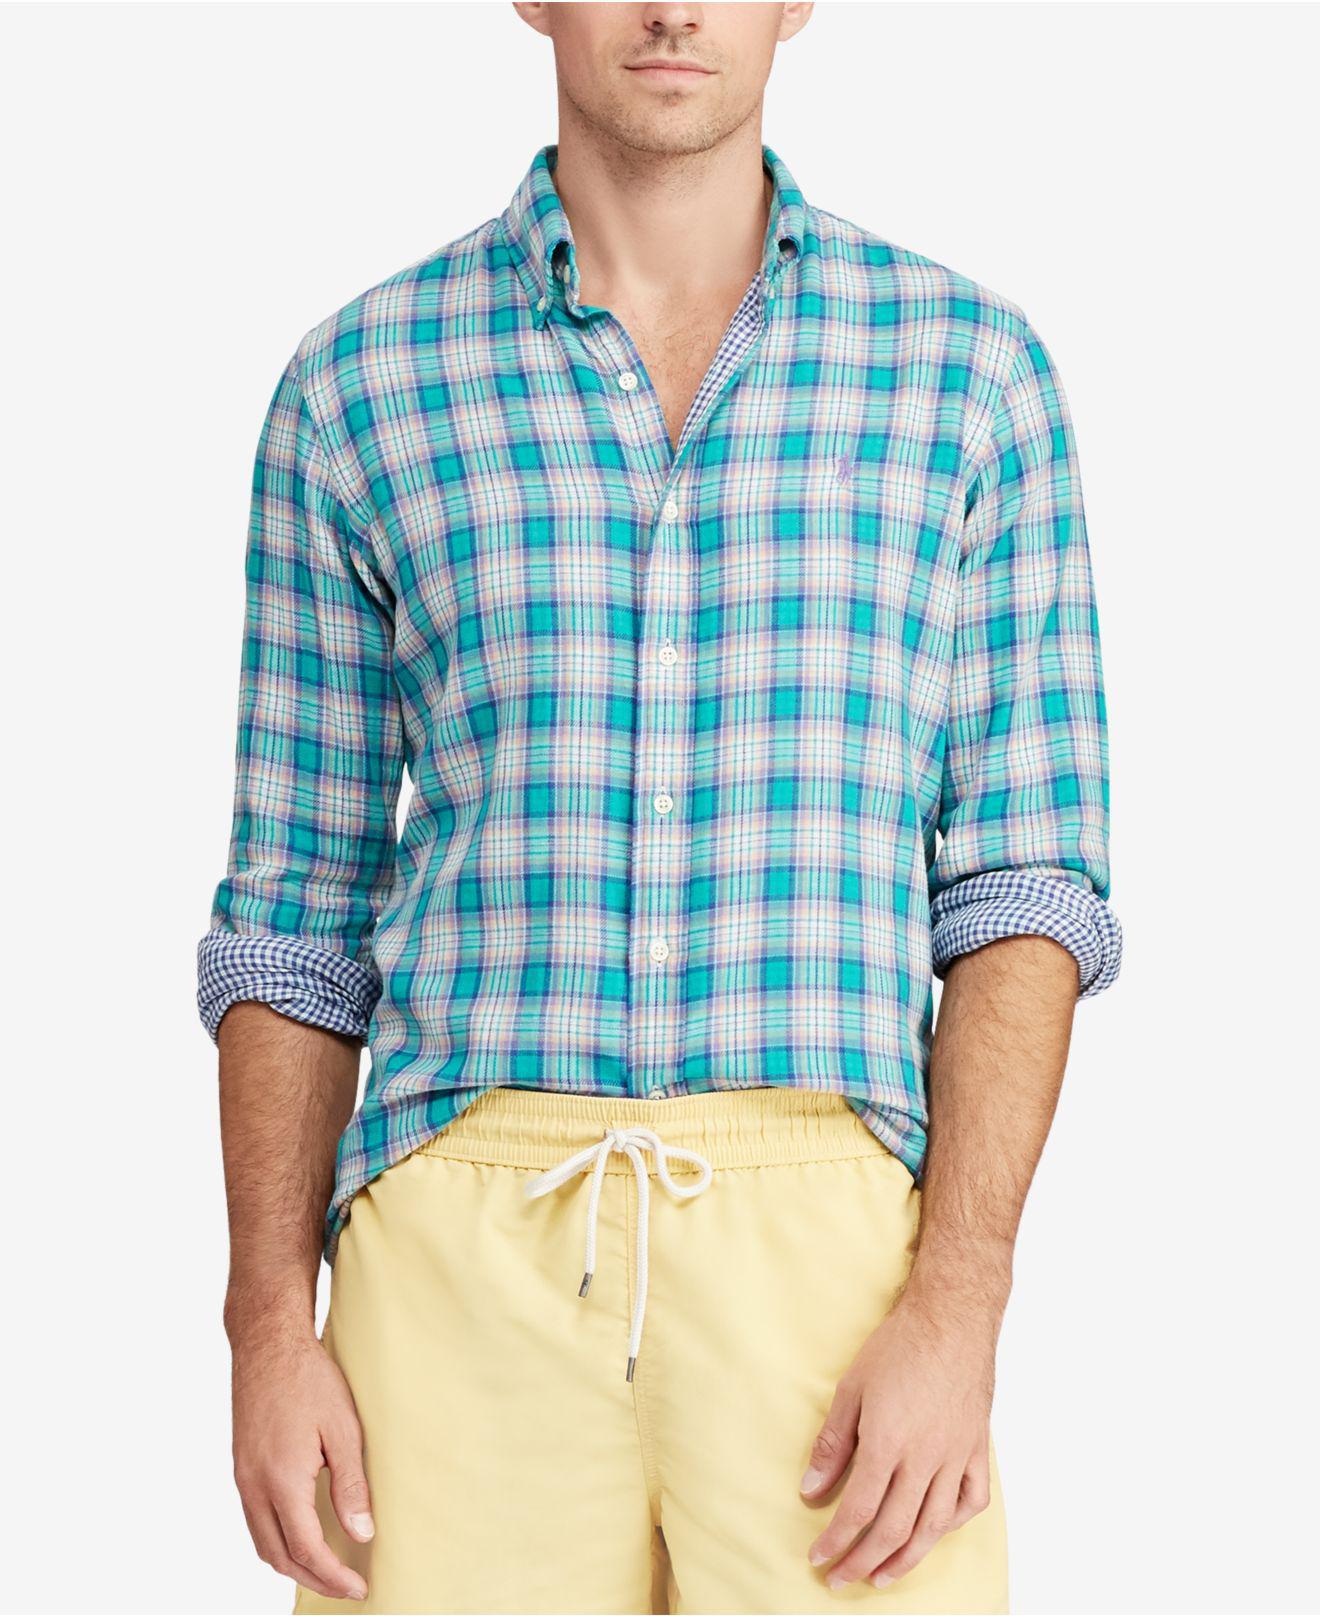 506841ec1 ... denmark polo ralph lauren. mens blue classic fit plaid shirt 63587 8f4b7